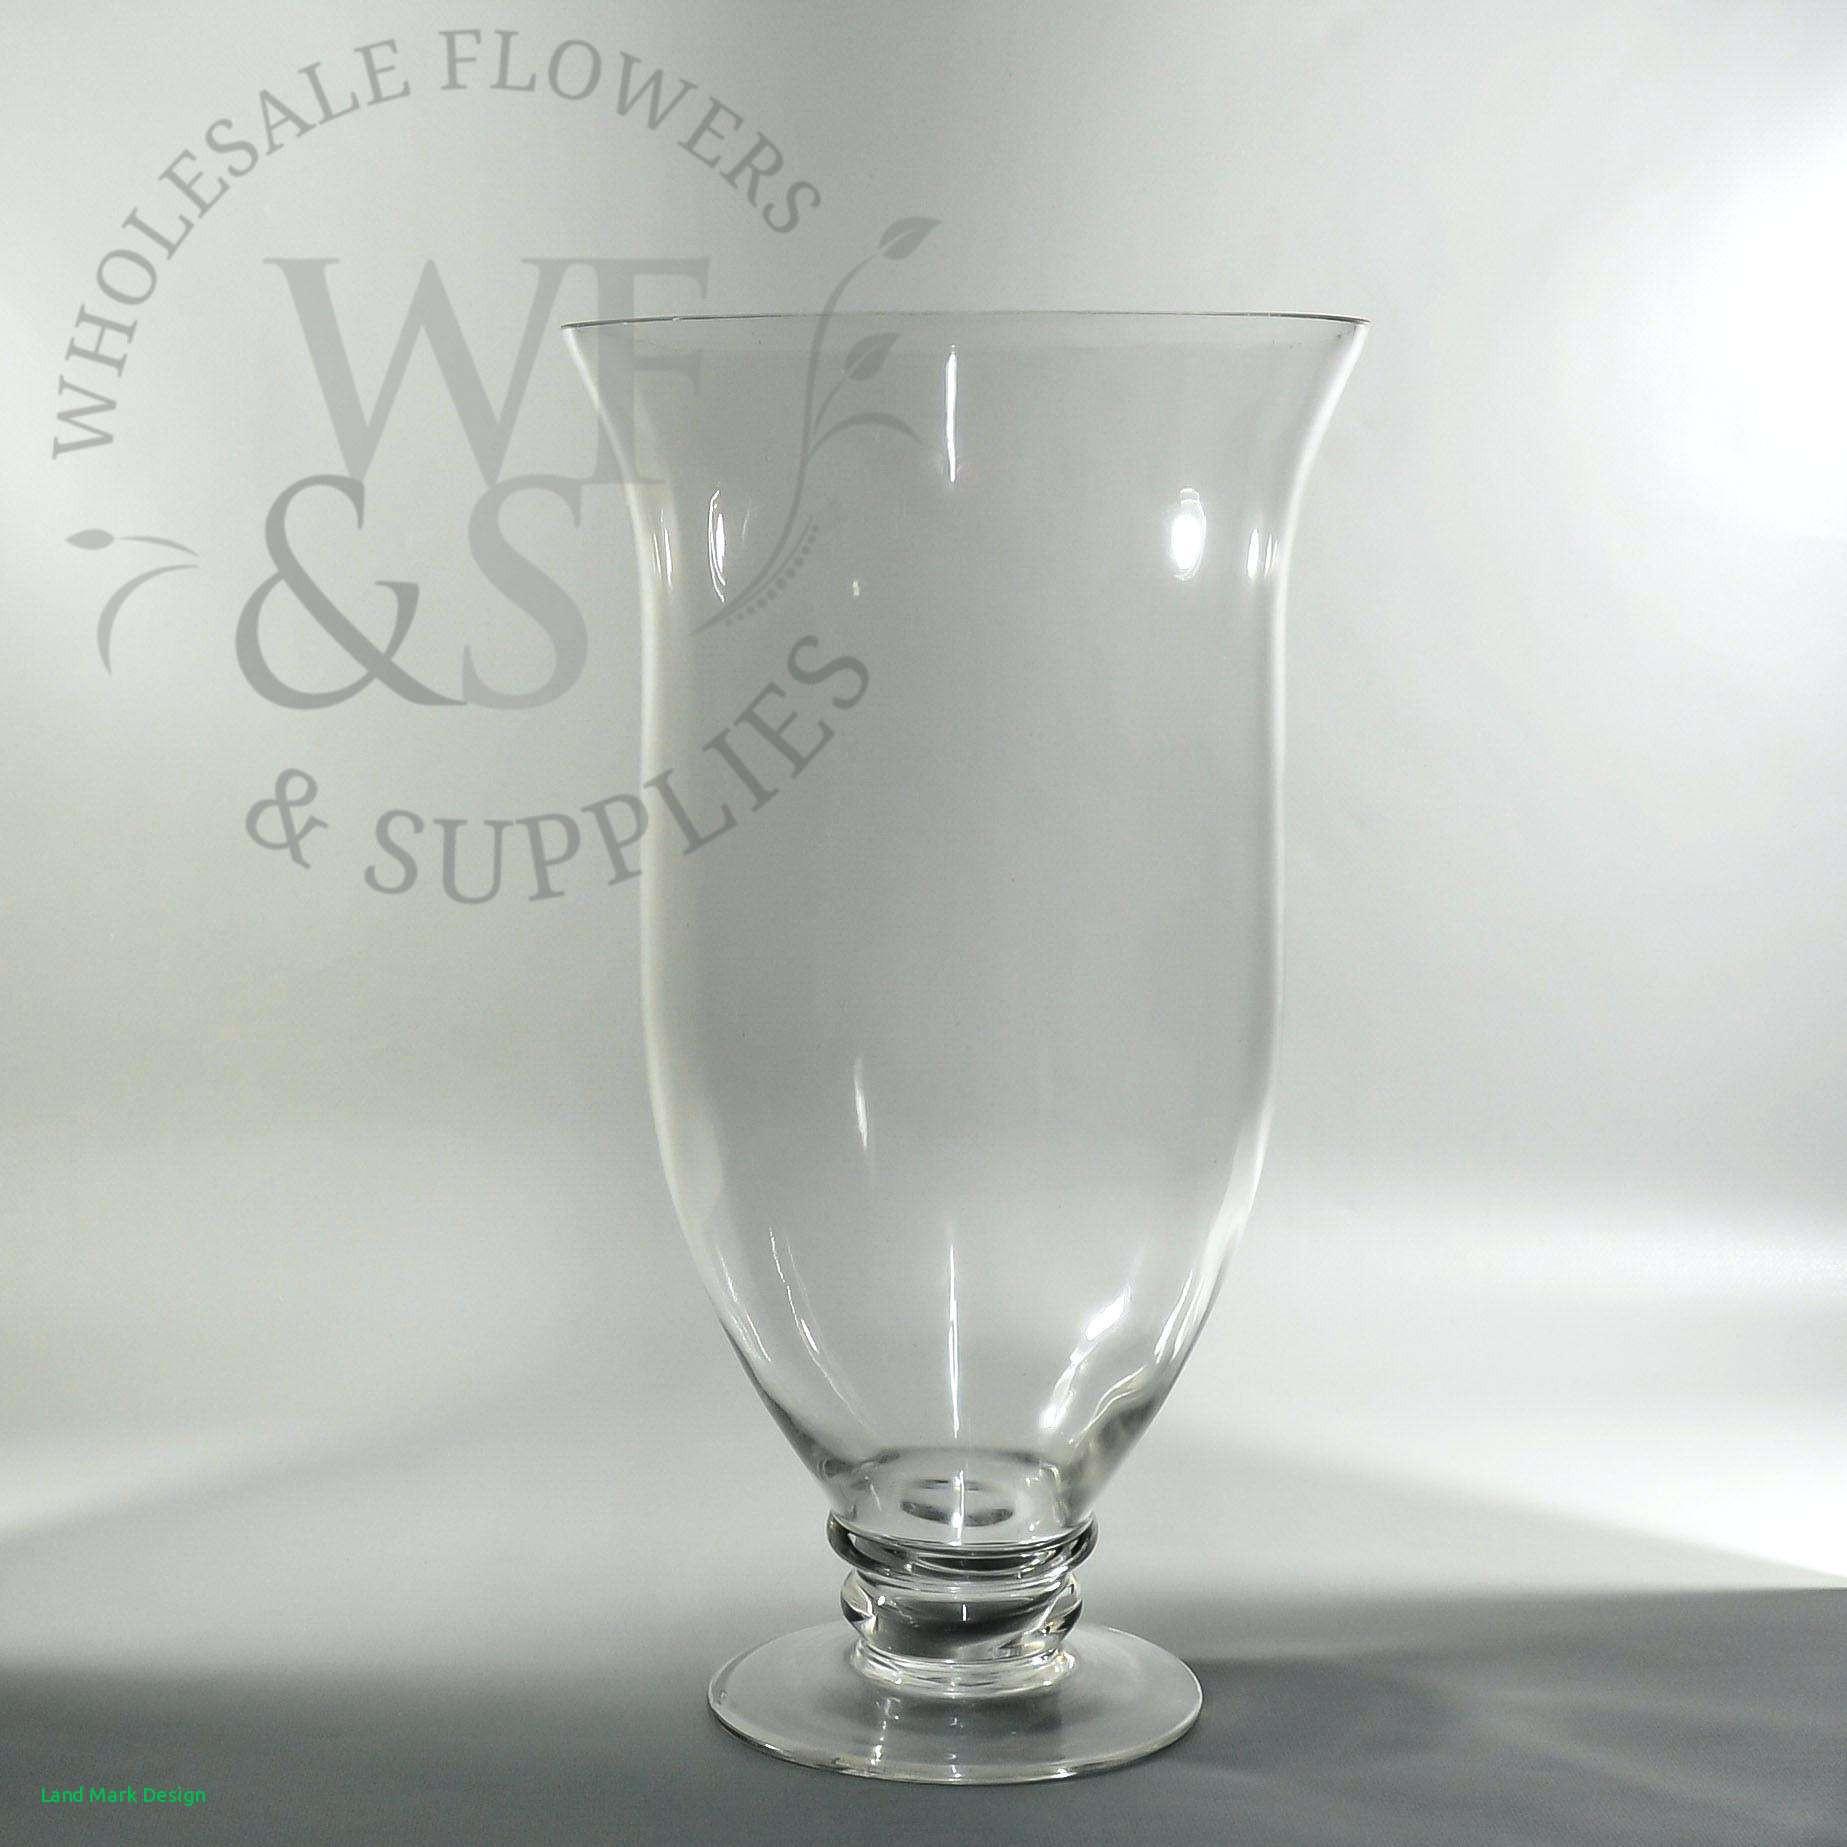 large glass vases bulk of large glass vases image glass vase ideas design vases artificial in large glass vases image glass vase ideas design of large glass vases image glass vase ideas